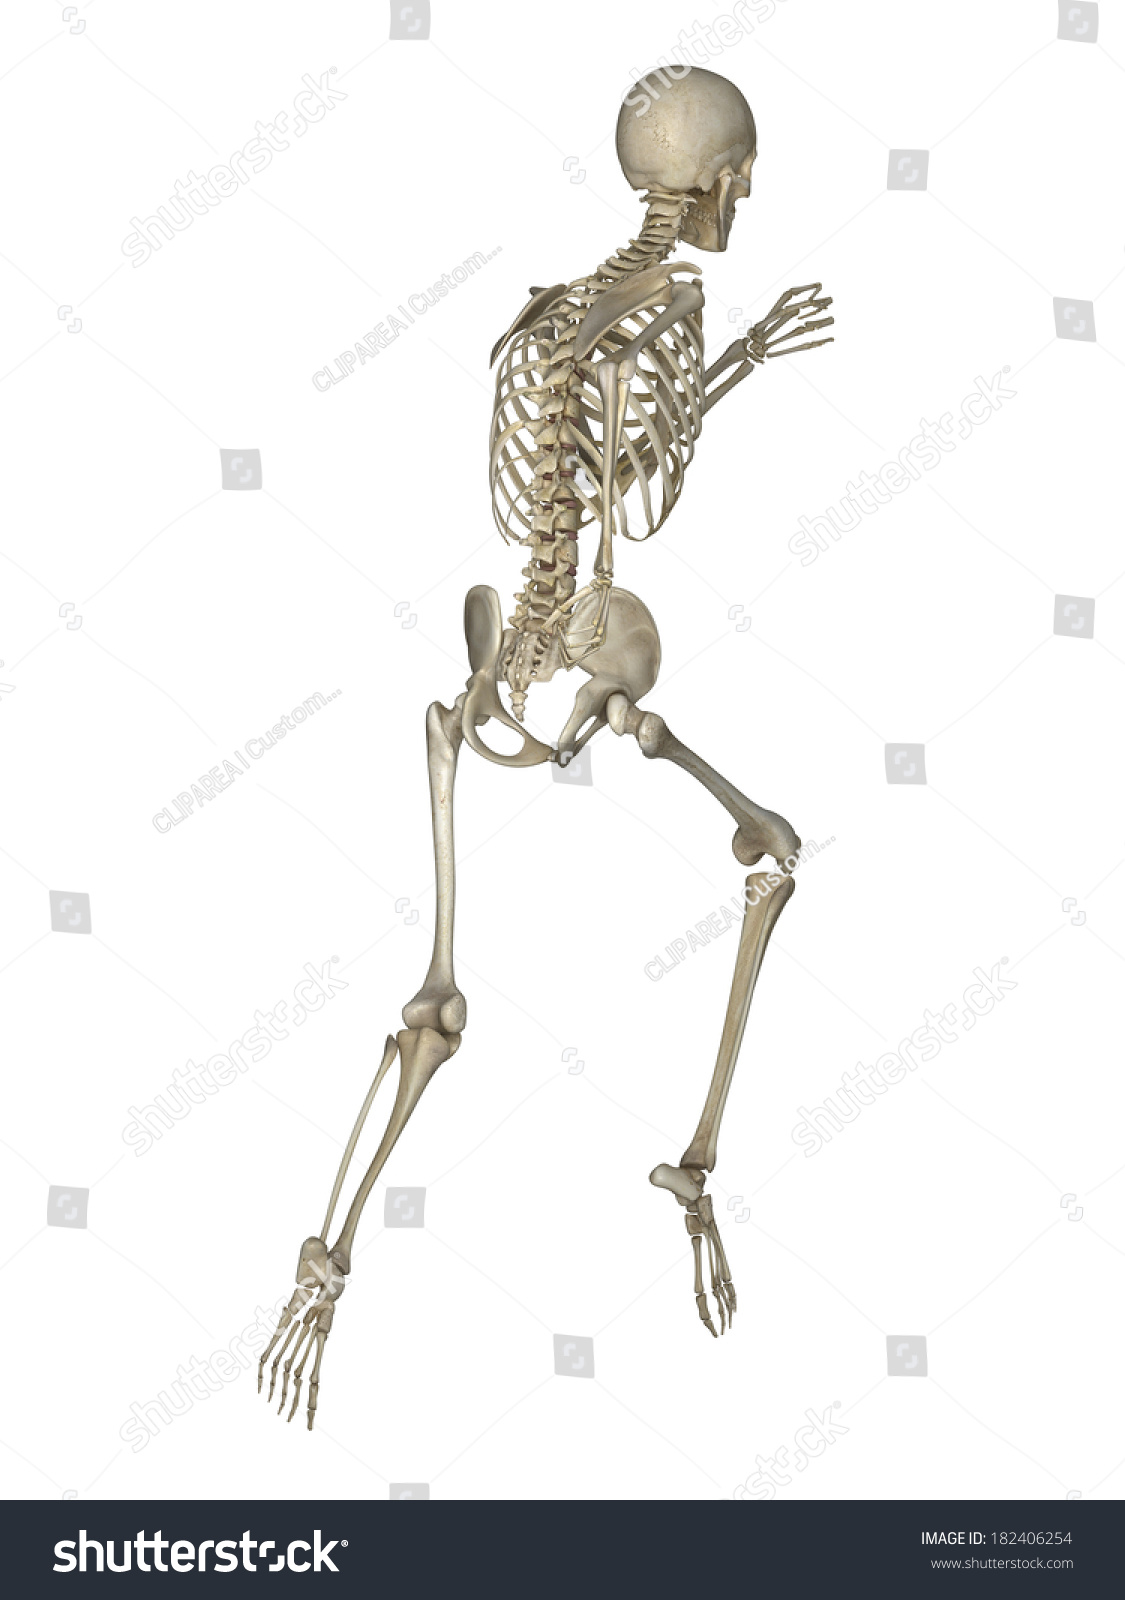 Running Skeleton Anatomy Stock Illustration 182406254 - Shutterstock